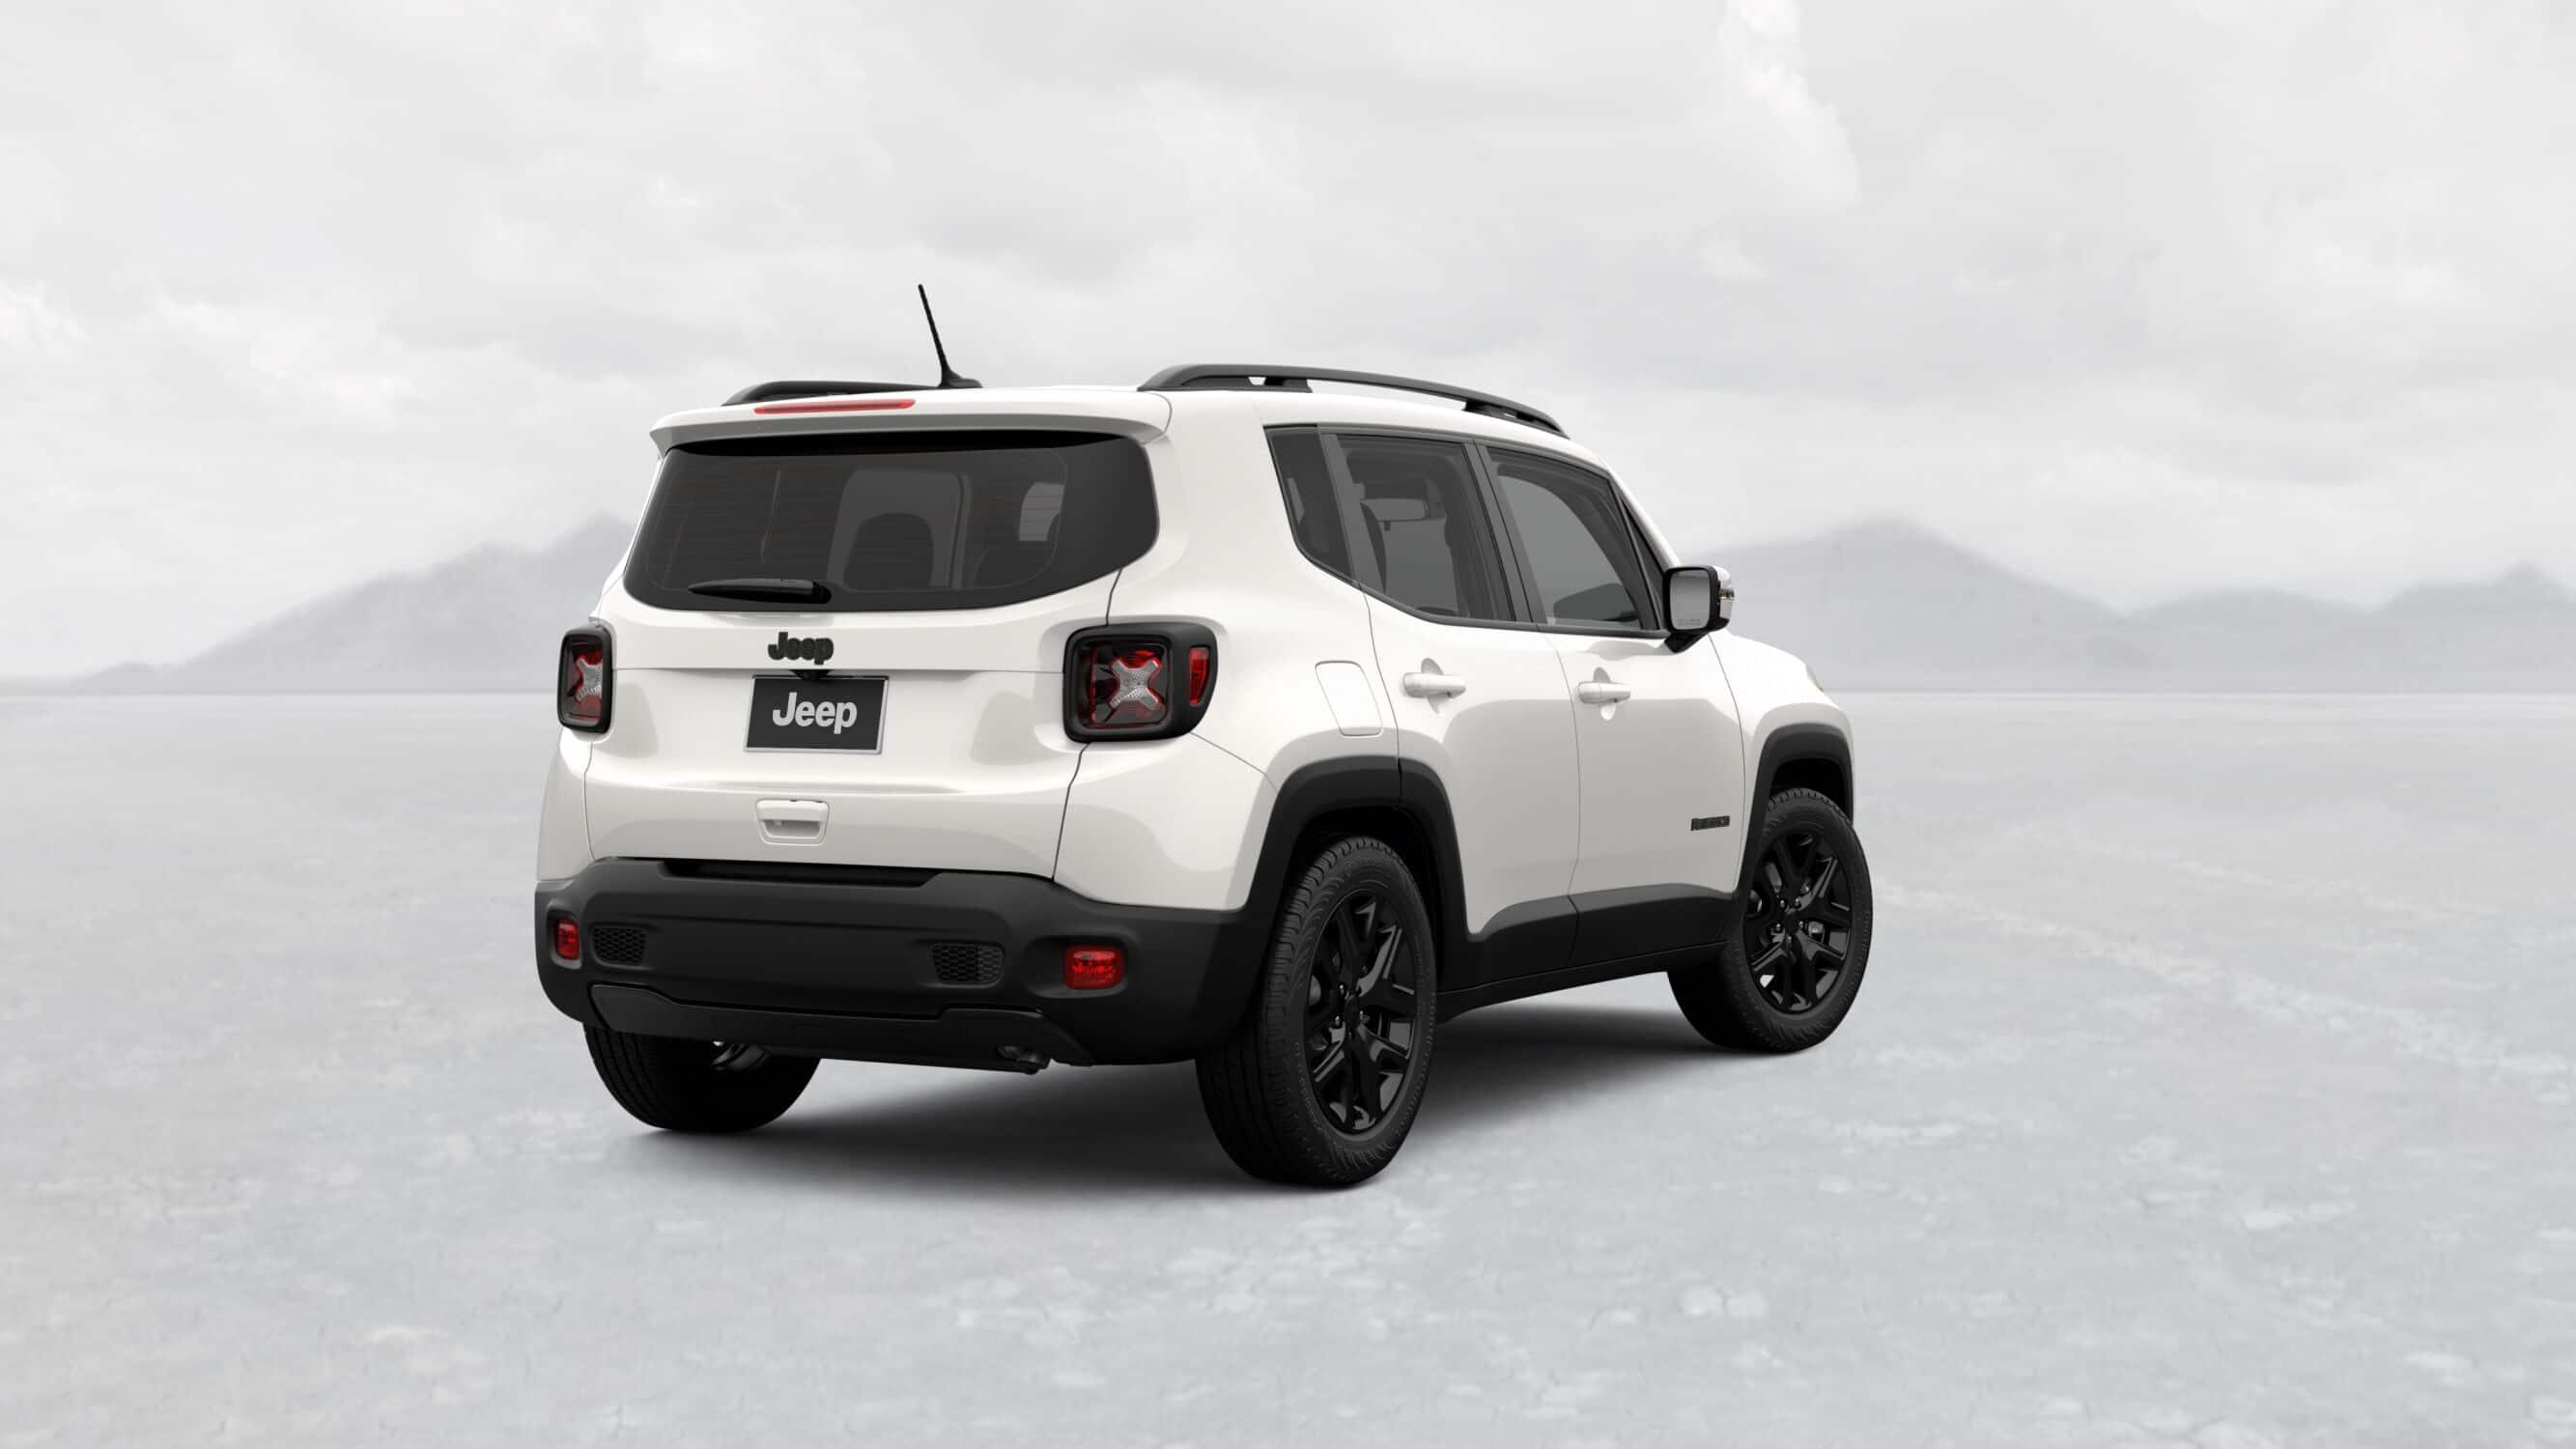 2019 Jeep Renegade Altitude Rainbow Chrysler Dodge Jeep Ram Covington La